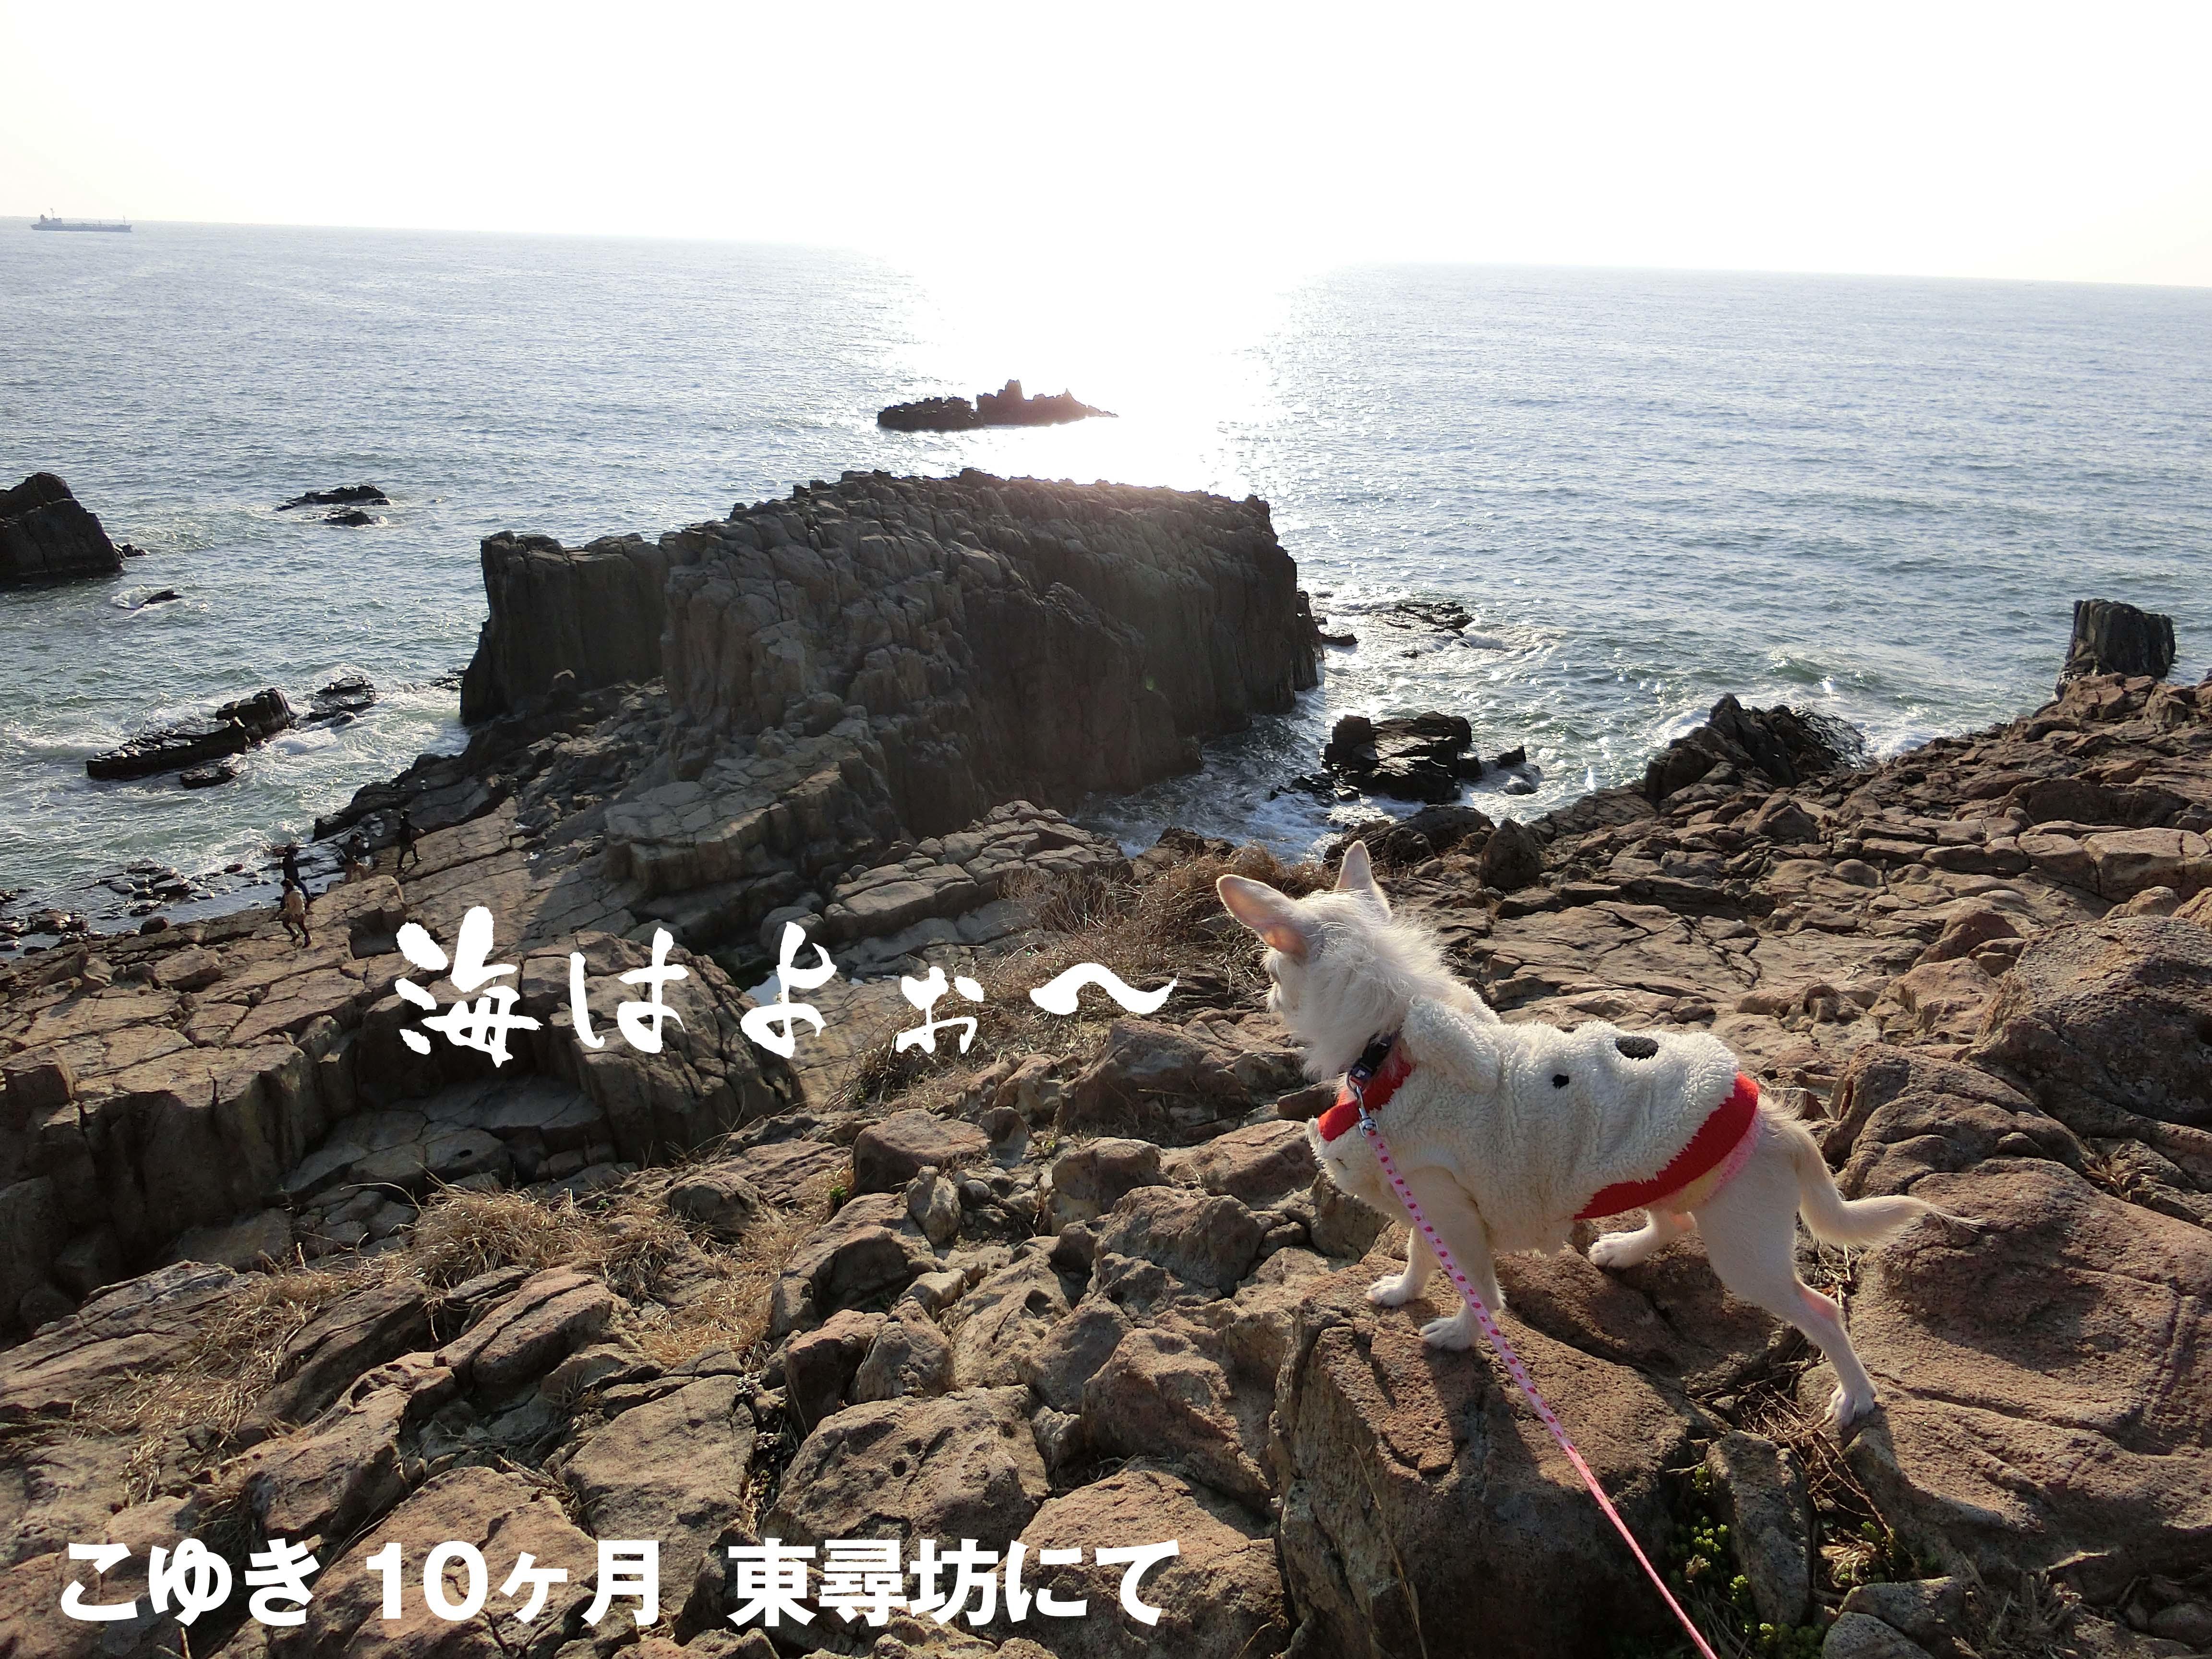 東尋坊CIMG0249_c